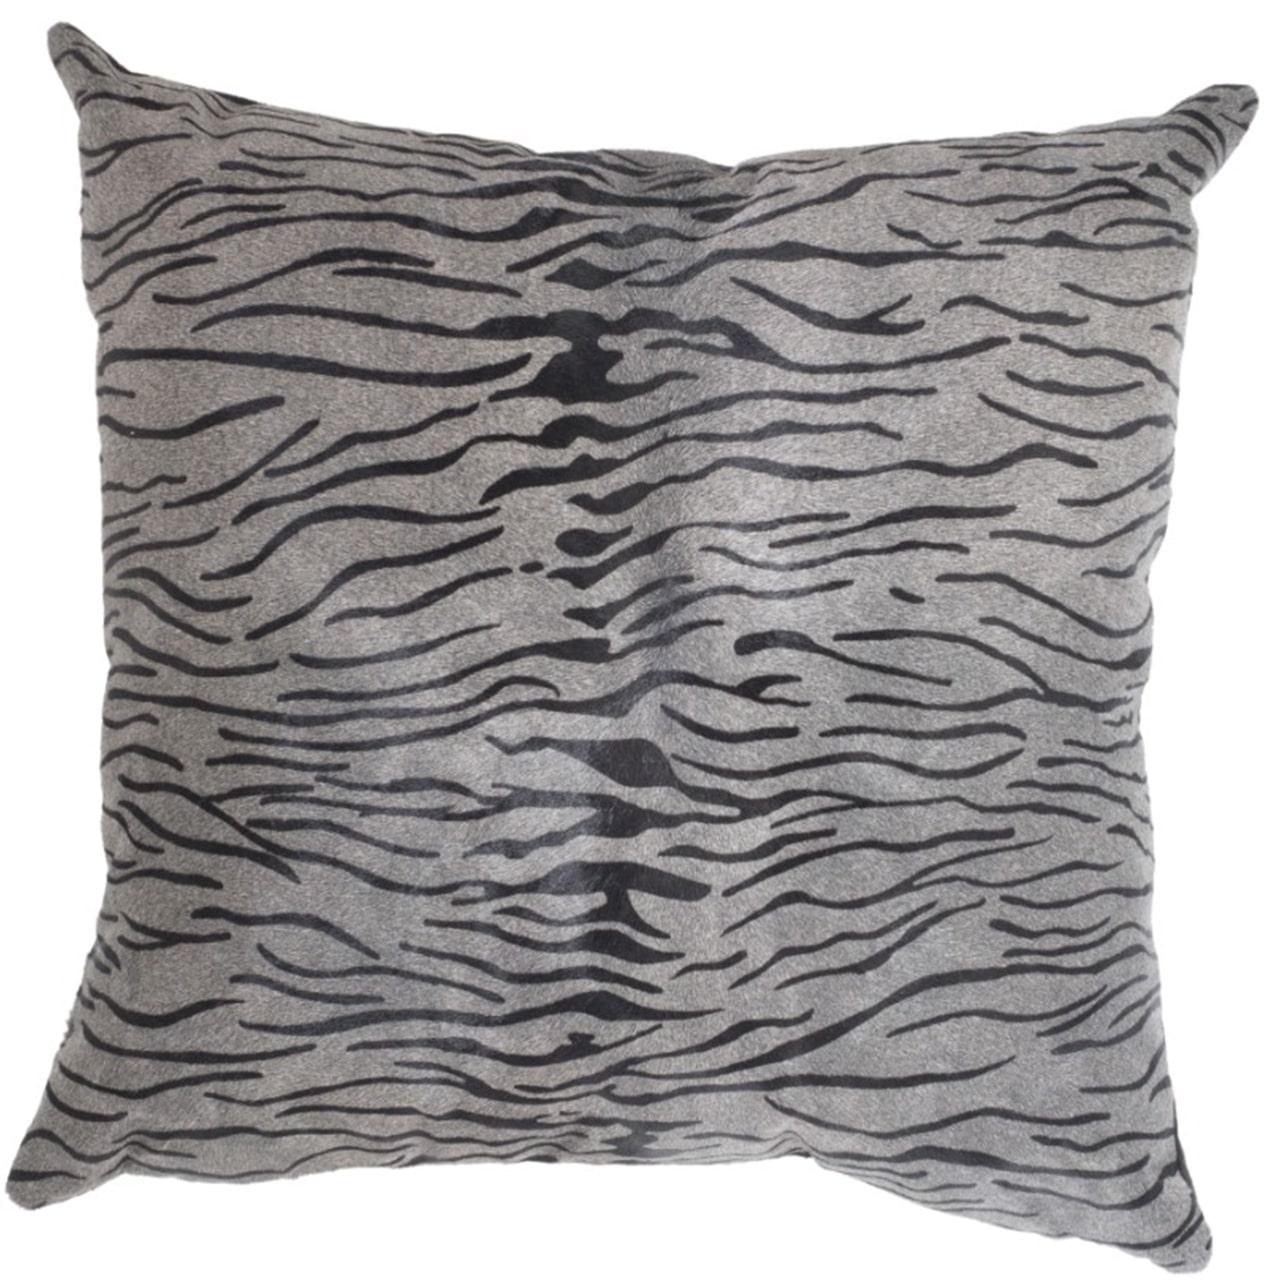 NEW-Cavallino Pillow- Tiger 1010- 605 PEG- 50x50cm(CPTIG1010605BL5050 - ANVOGG FEEL SHEARLING | ANVOGG